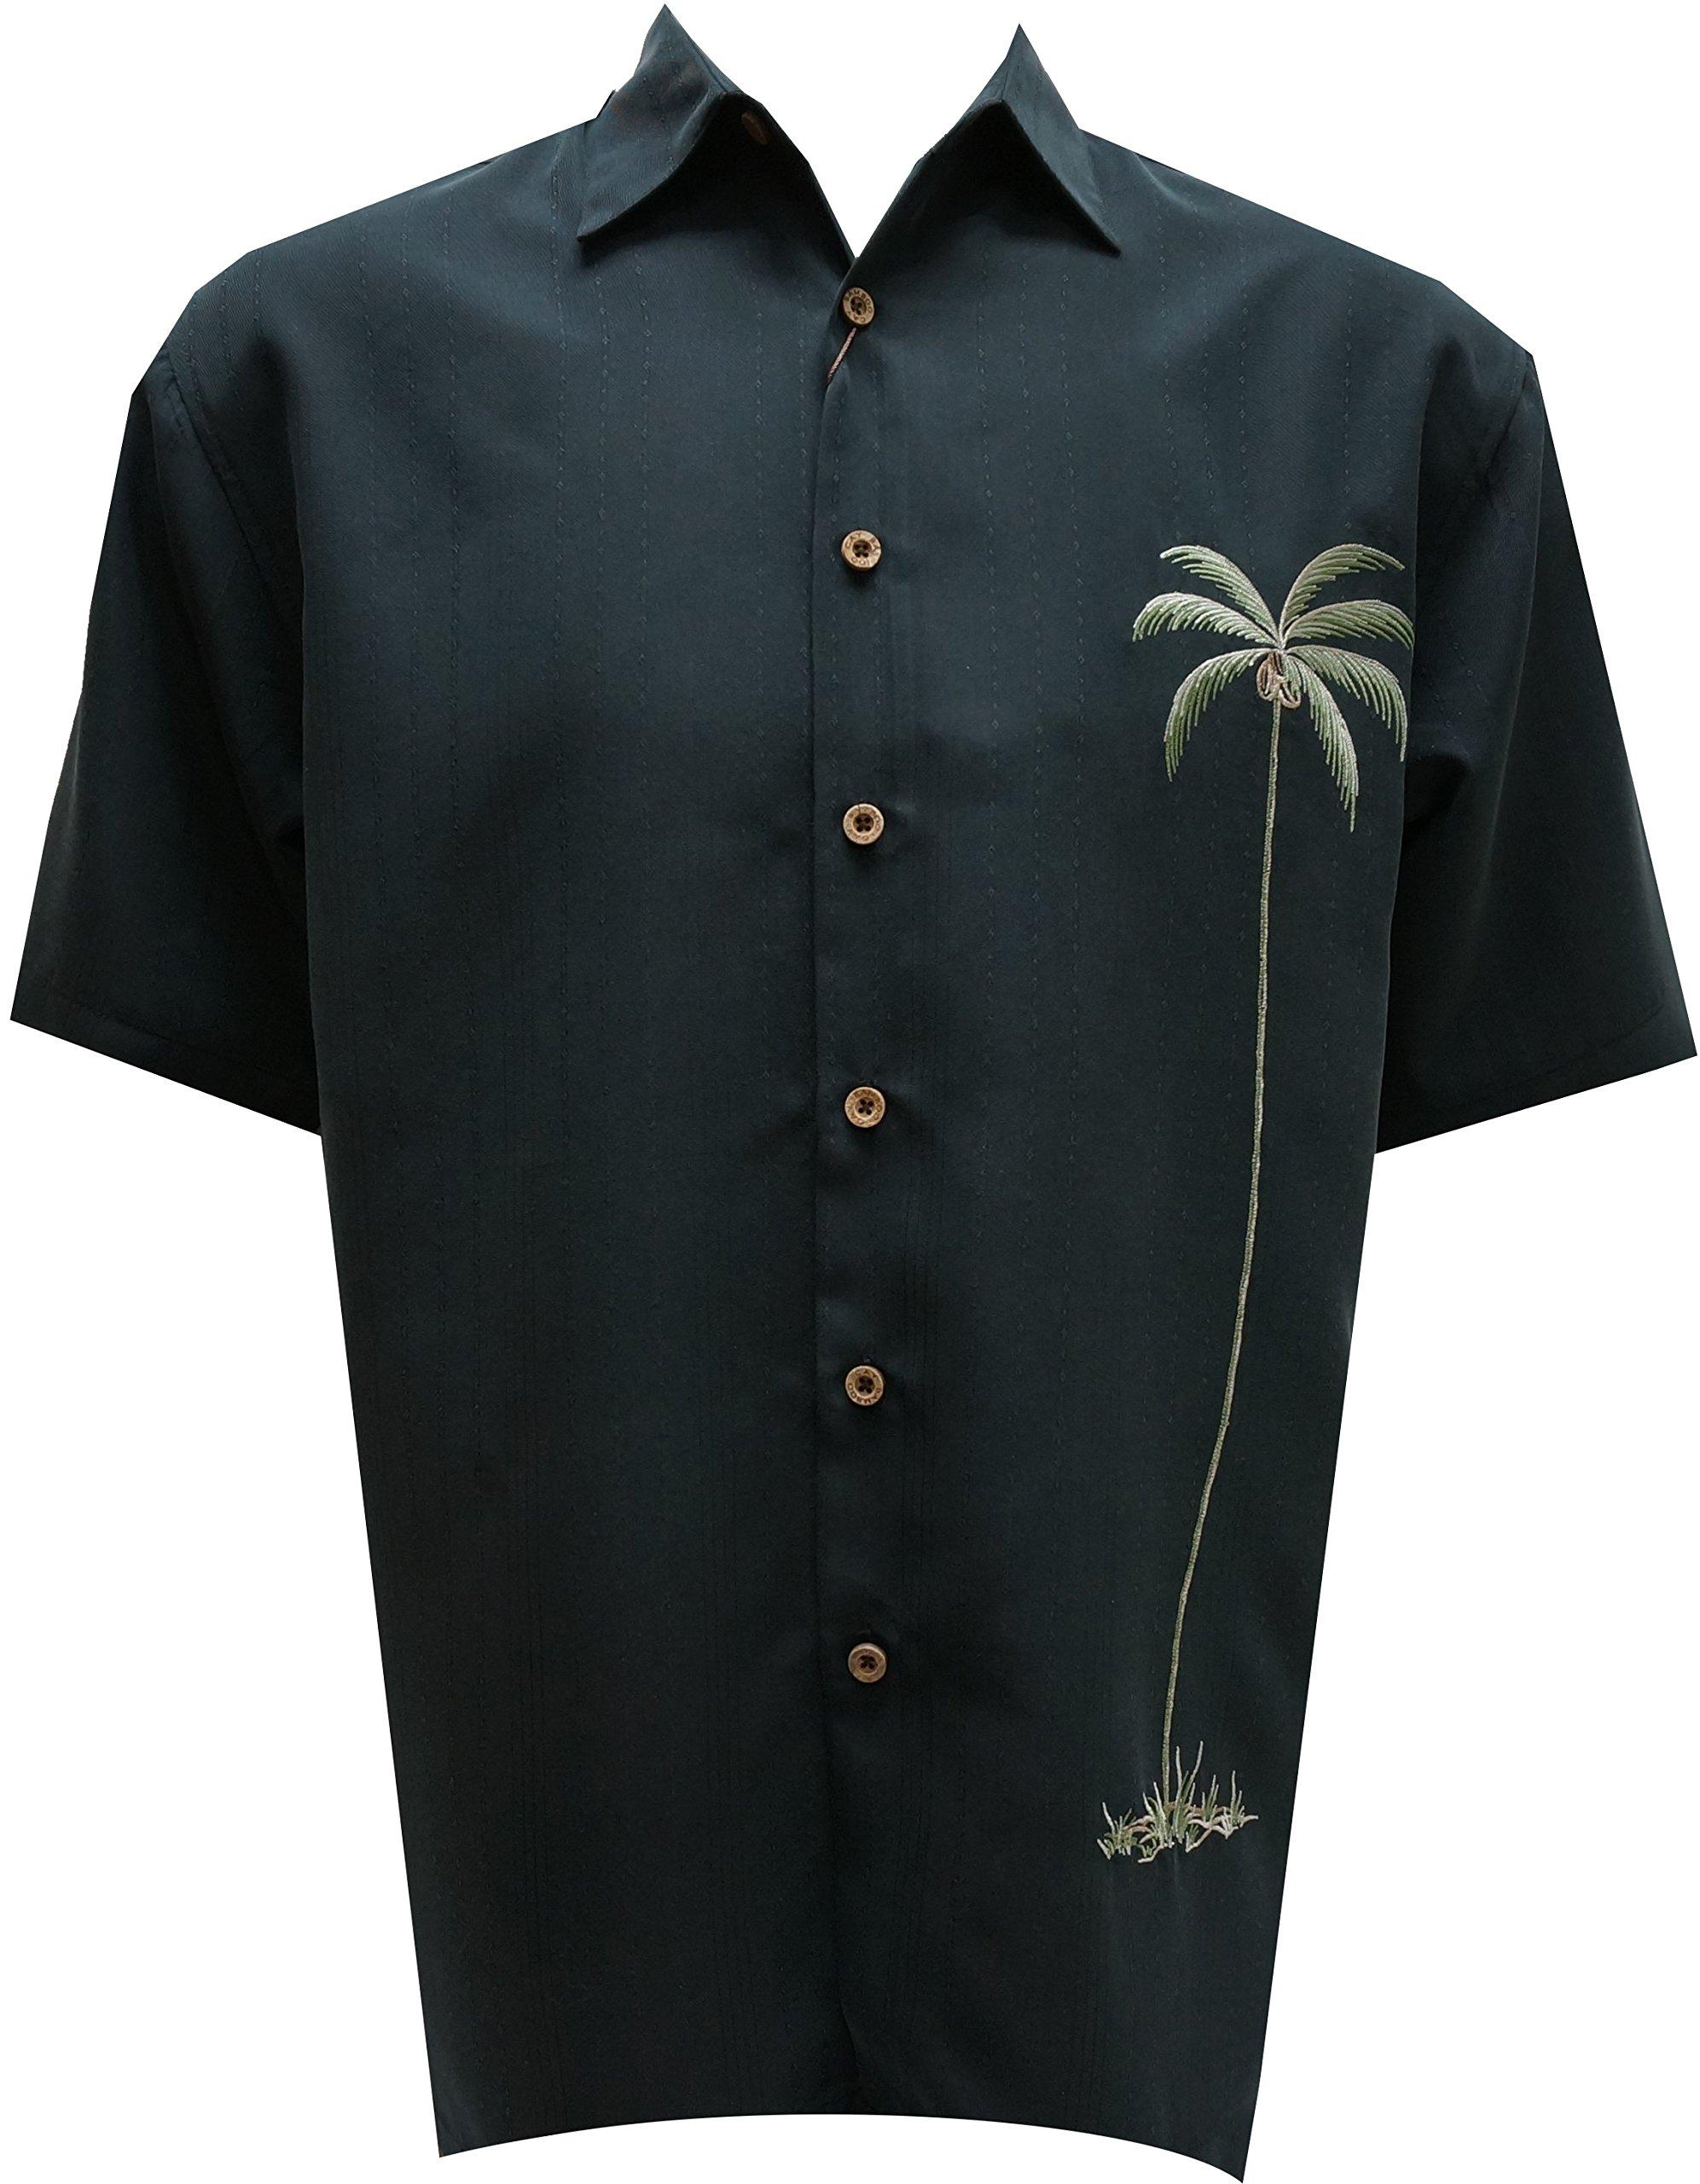 Bamboo Cay Mens Single Palm, Embroidered Short Sleeve Hawaiian Shirt (3XL, Black)